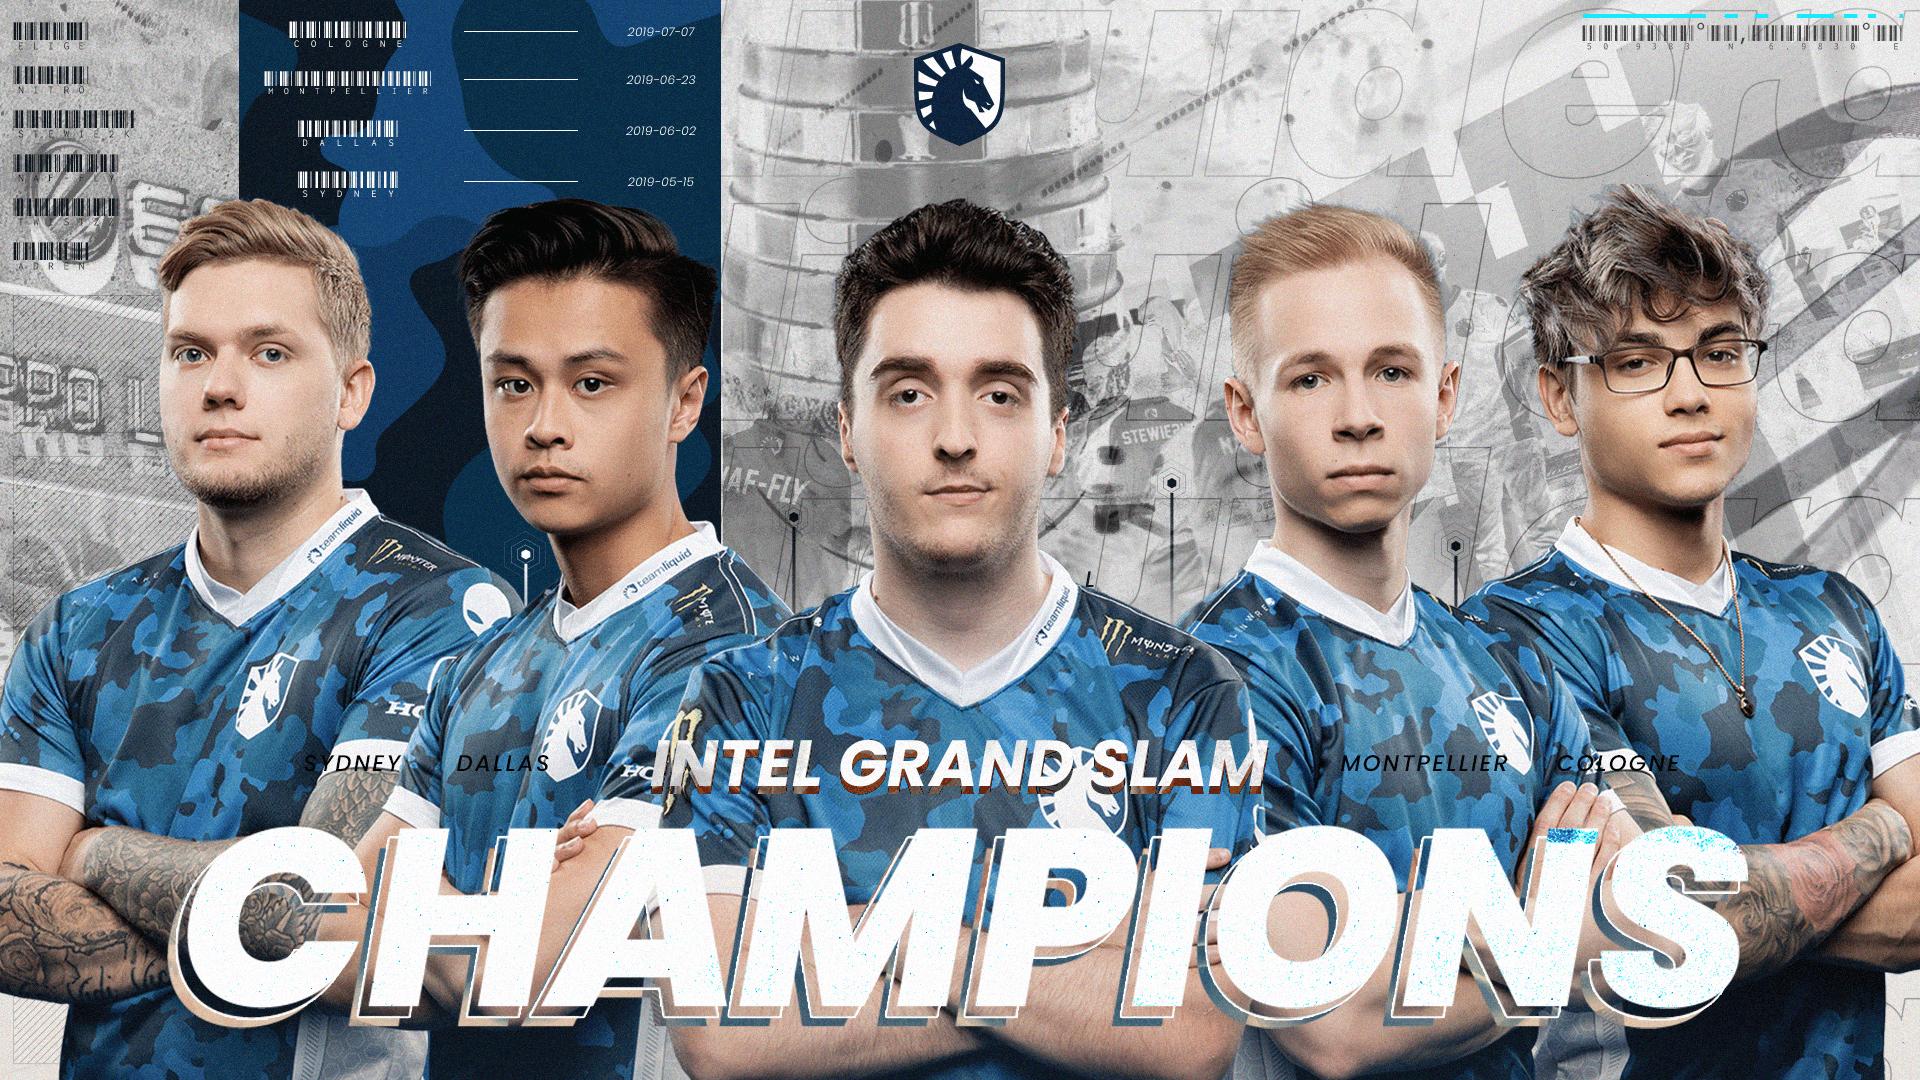 Team Liquid Intel Grand Slam